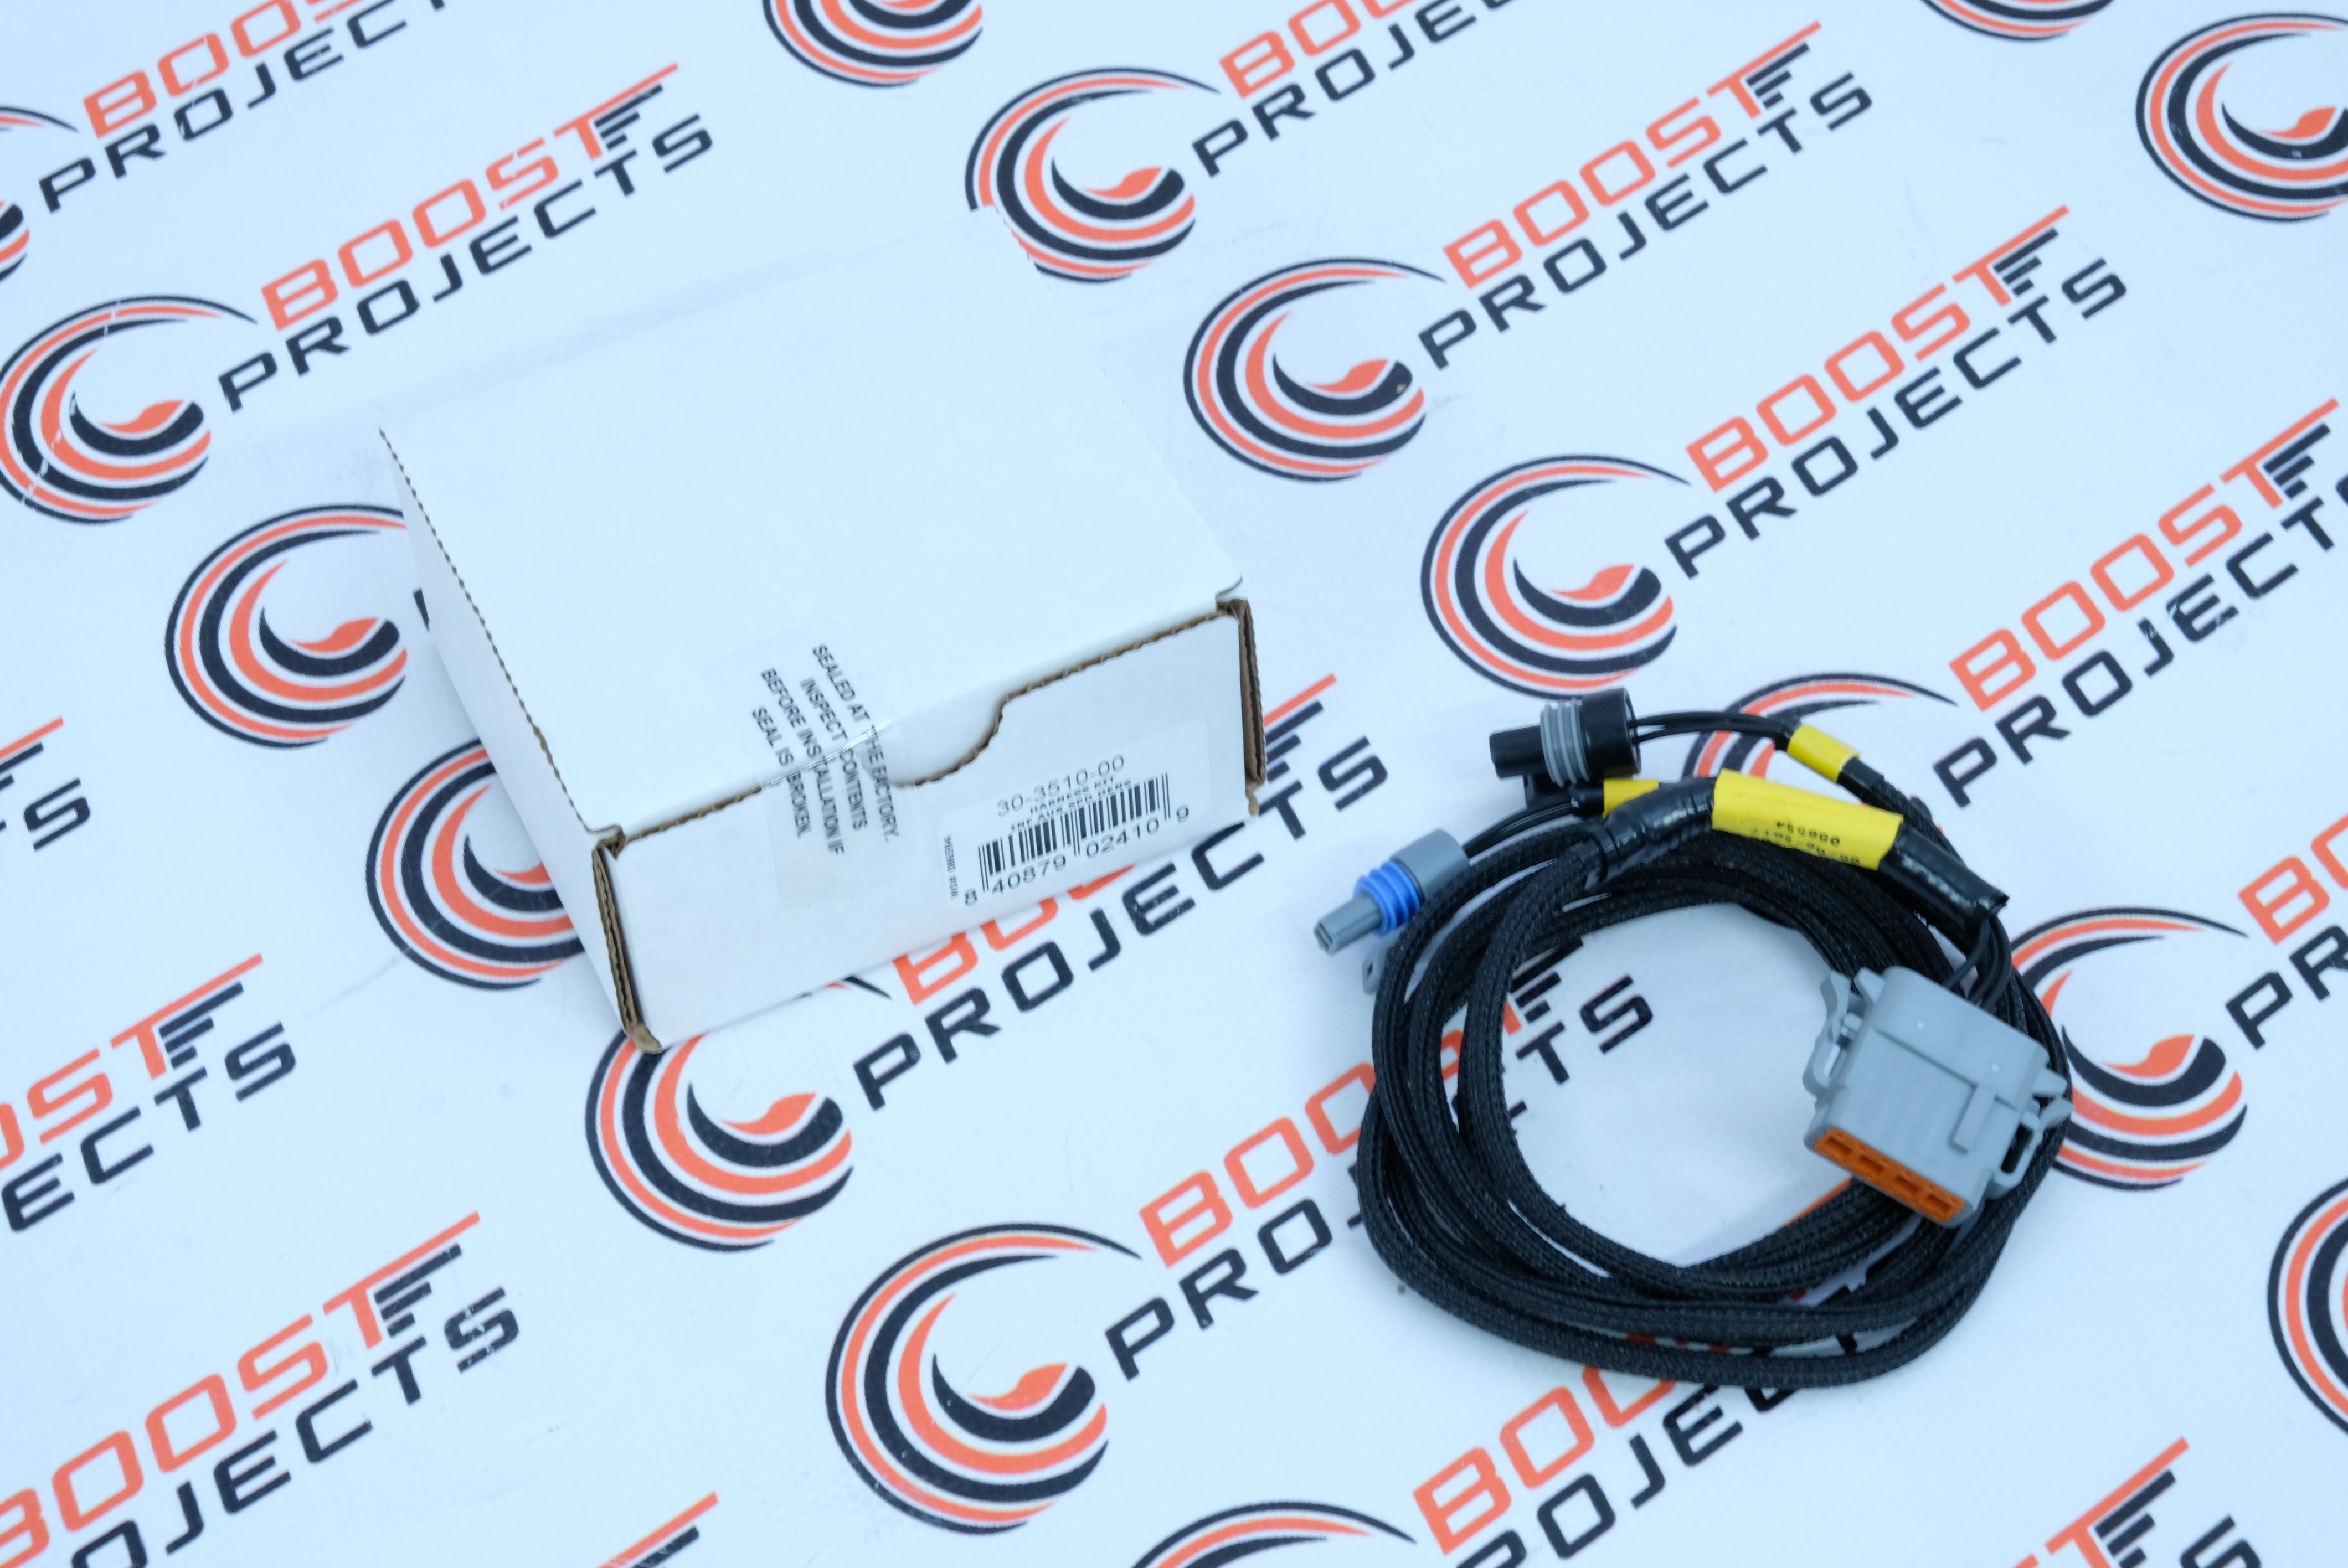 Aem Infinity Aux arnês para Aem Iat E 30-3510-00 Sensor do mapa   eBay   Aem Iat Wiring Harness      eBay